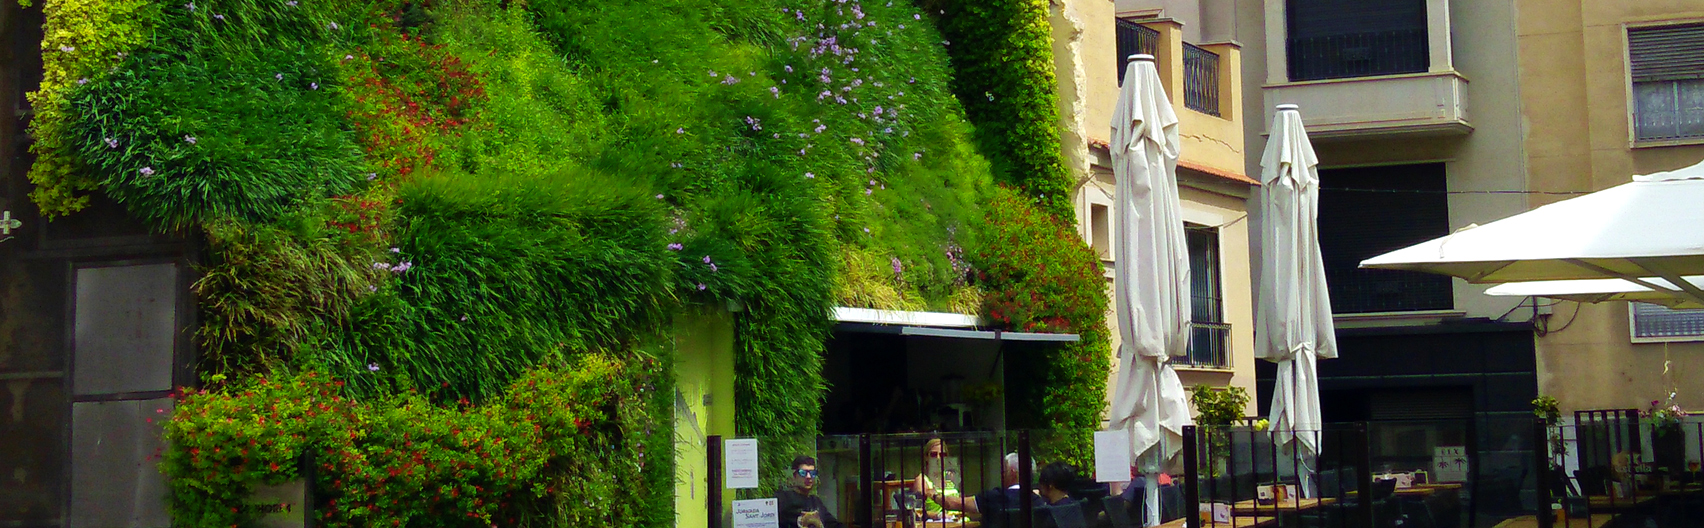 Proyecto de jardin vertical Paisajismo Urbano